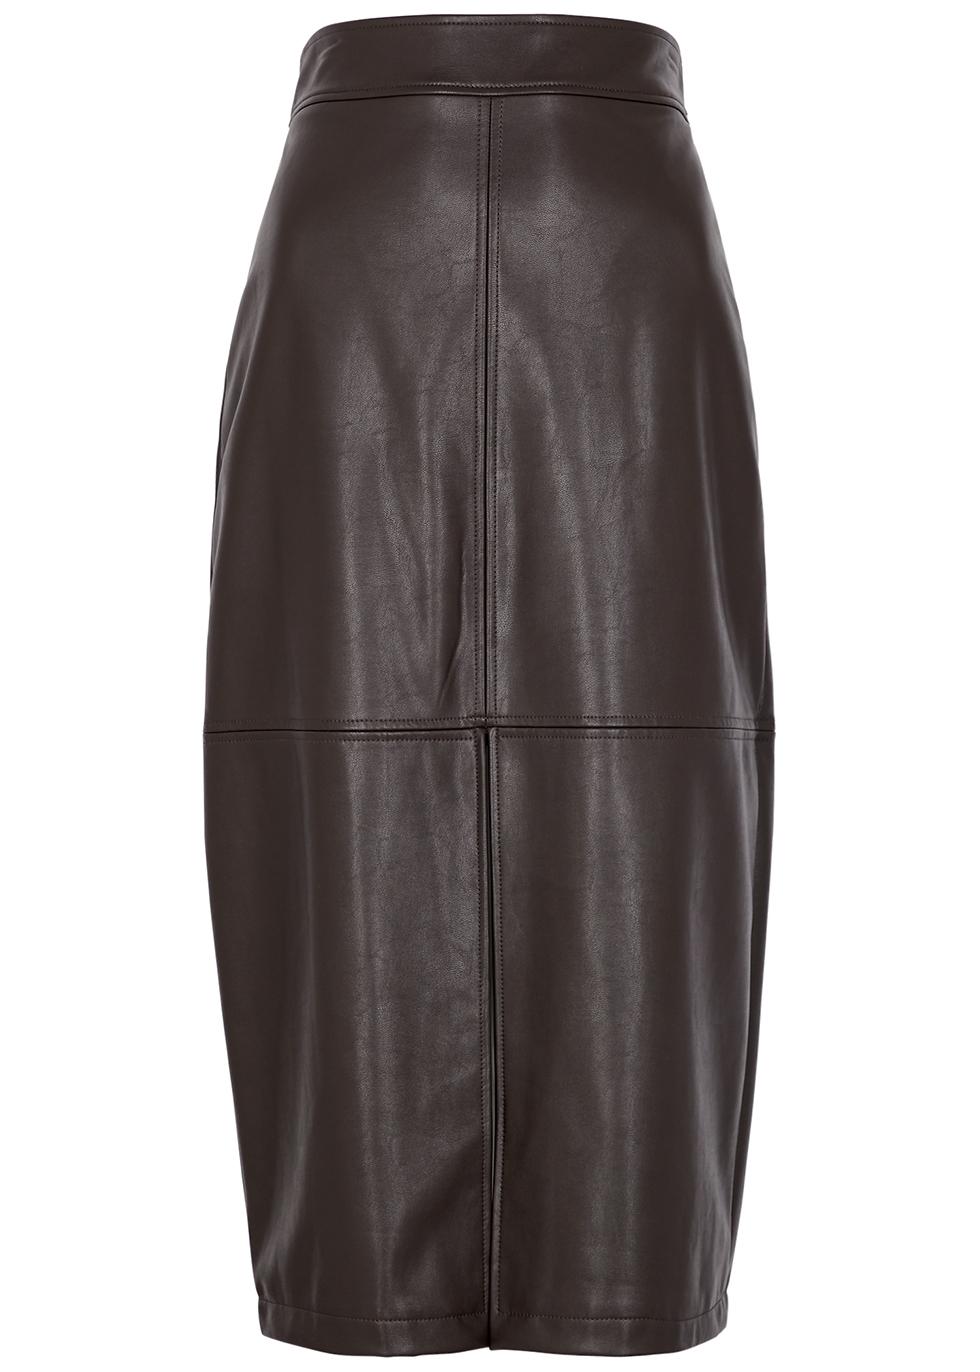 Moss dark brown faux leather midi skirt